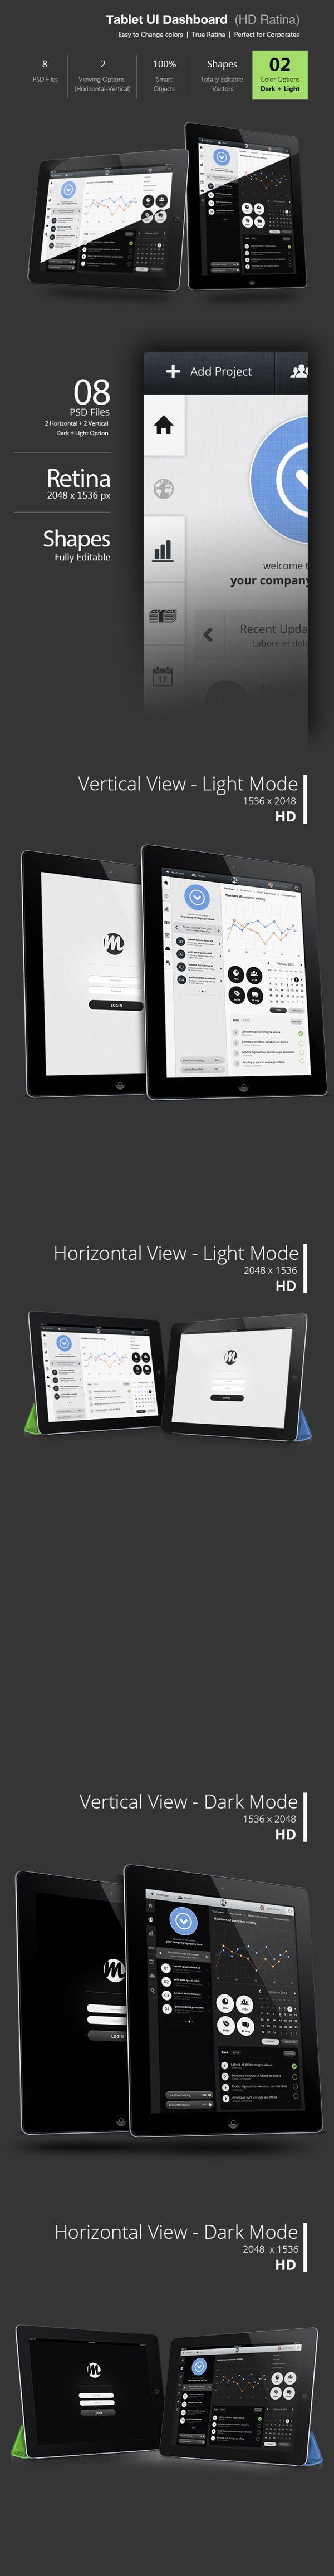 Tablet Dashboard Ui (Retina) by Bouncy Studio, via Behance